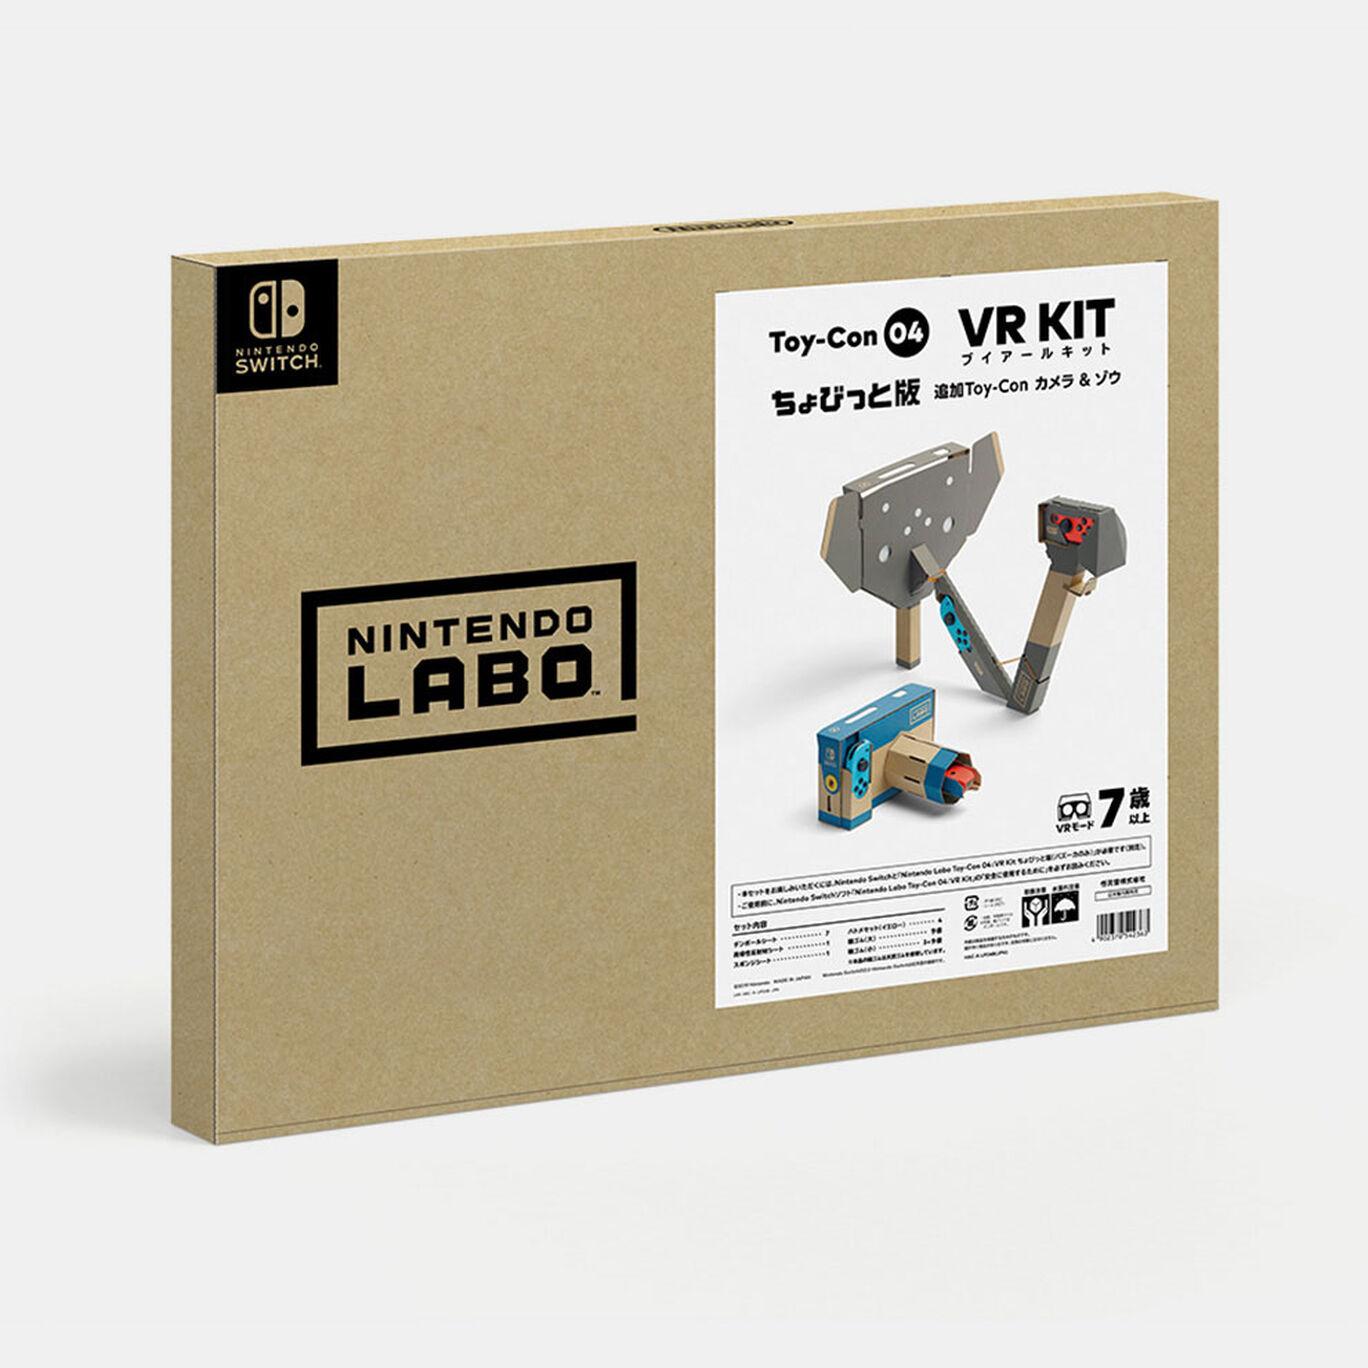 Nintendo Labo Toy-Con 04: VR Kit ちょびっと版追加Toy-Con カメラ&ゾウ